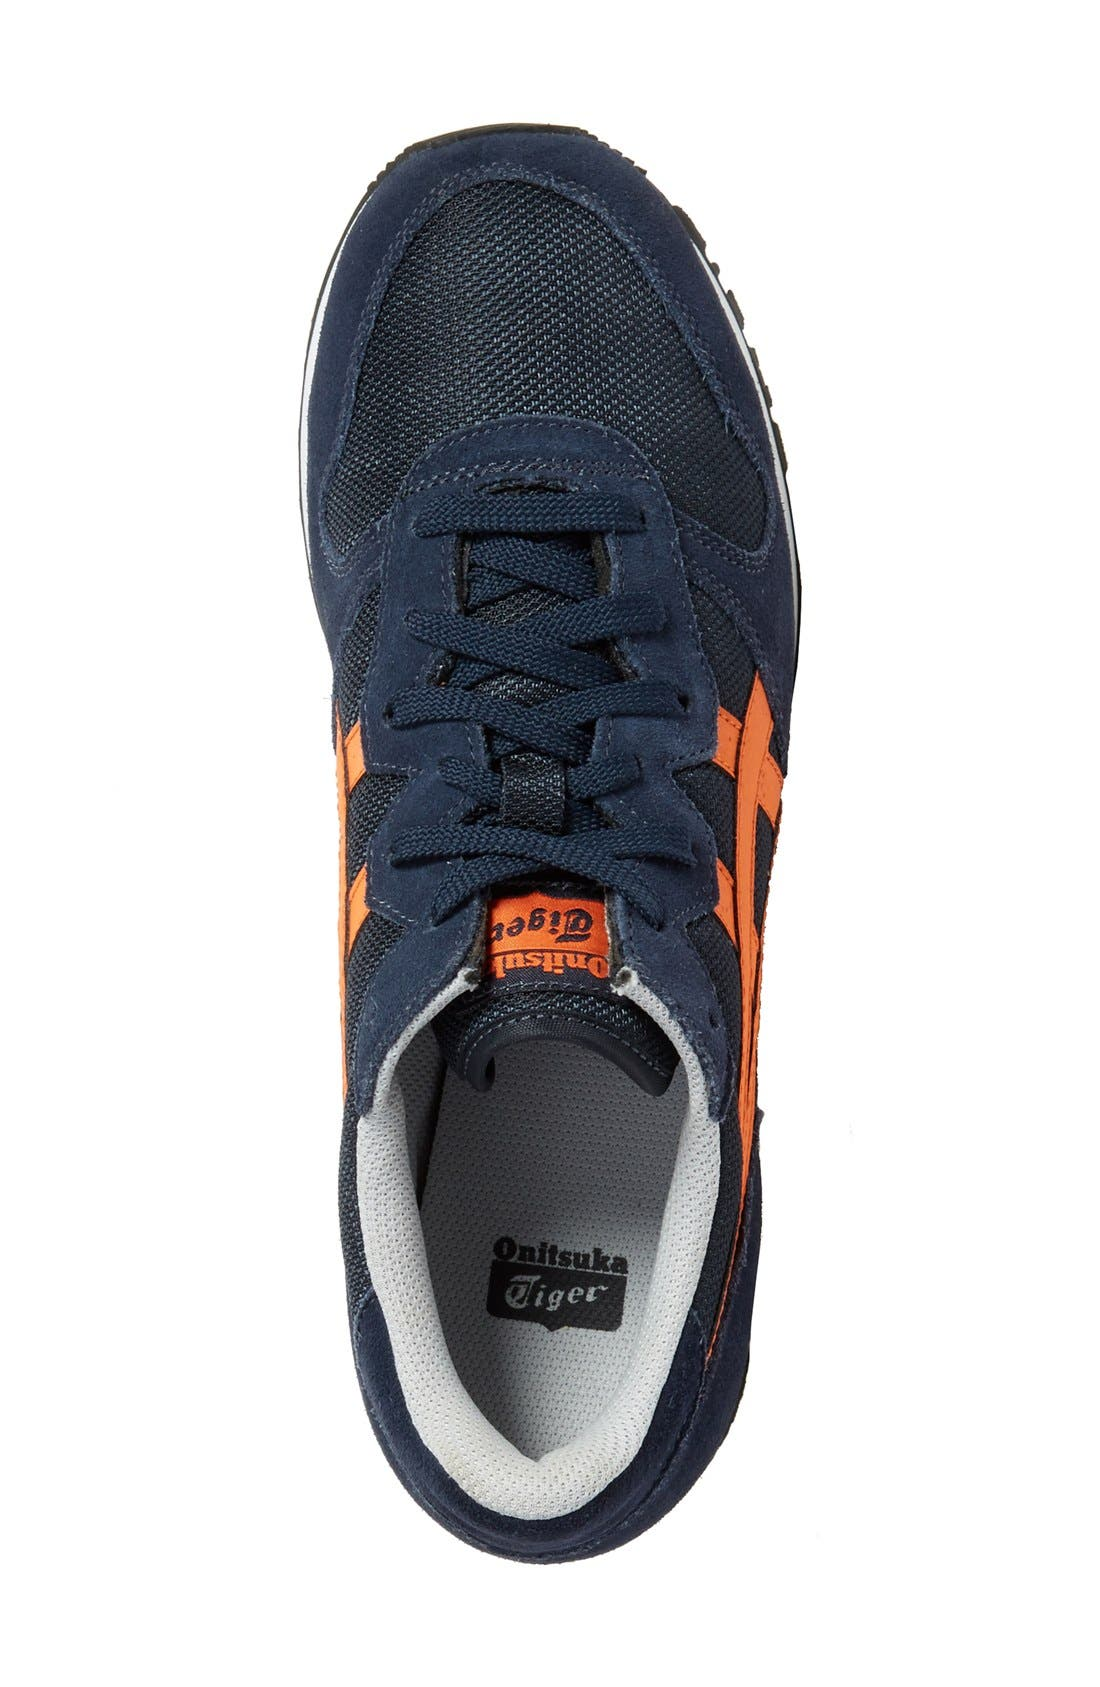 Alternate Image 3  - ASICS® Onitsuka Tiger 'Alvarado' Sneaker (Men)